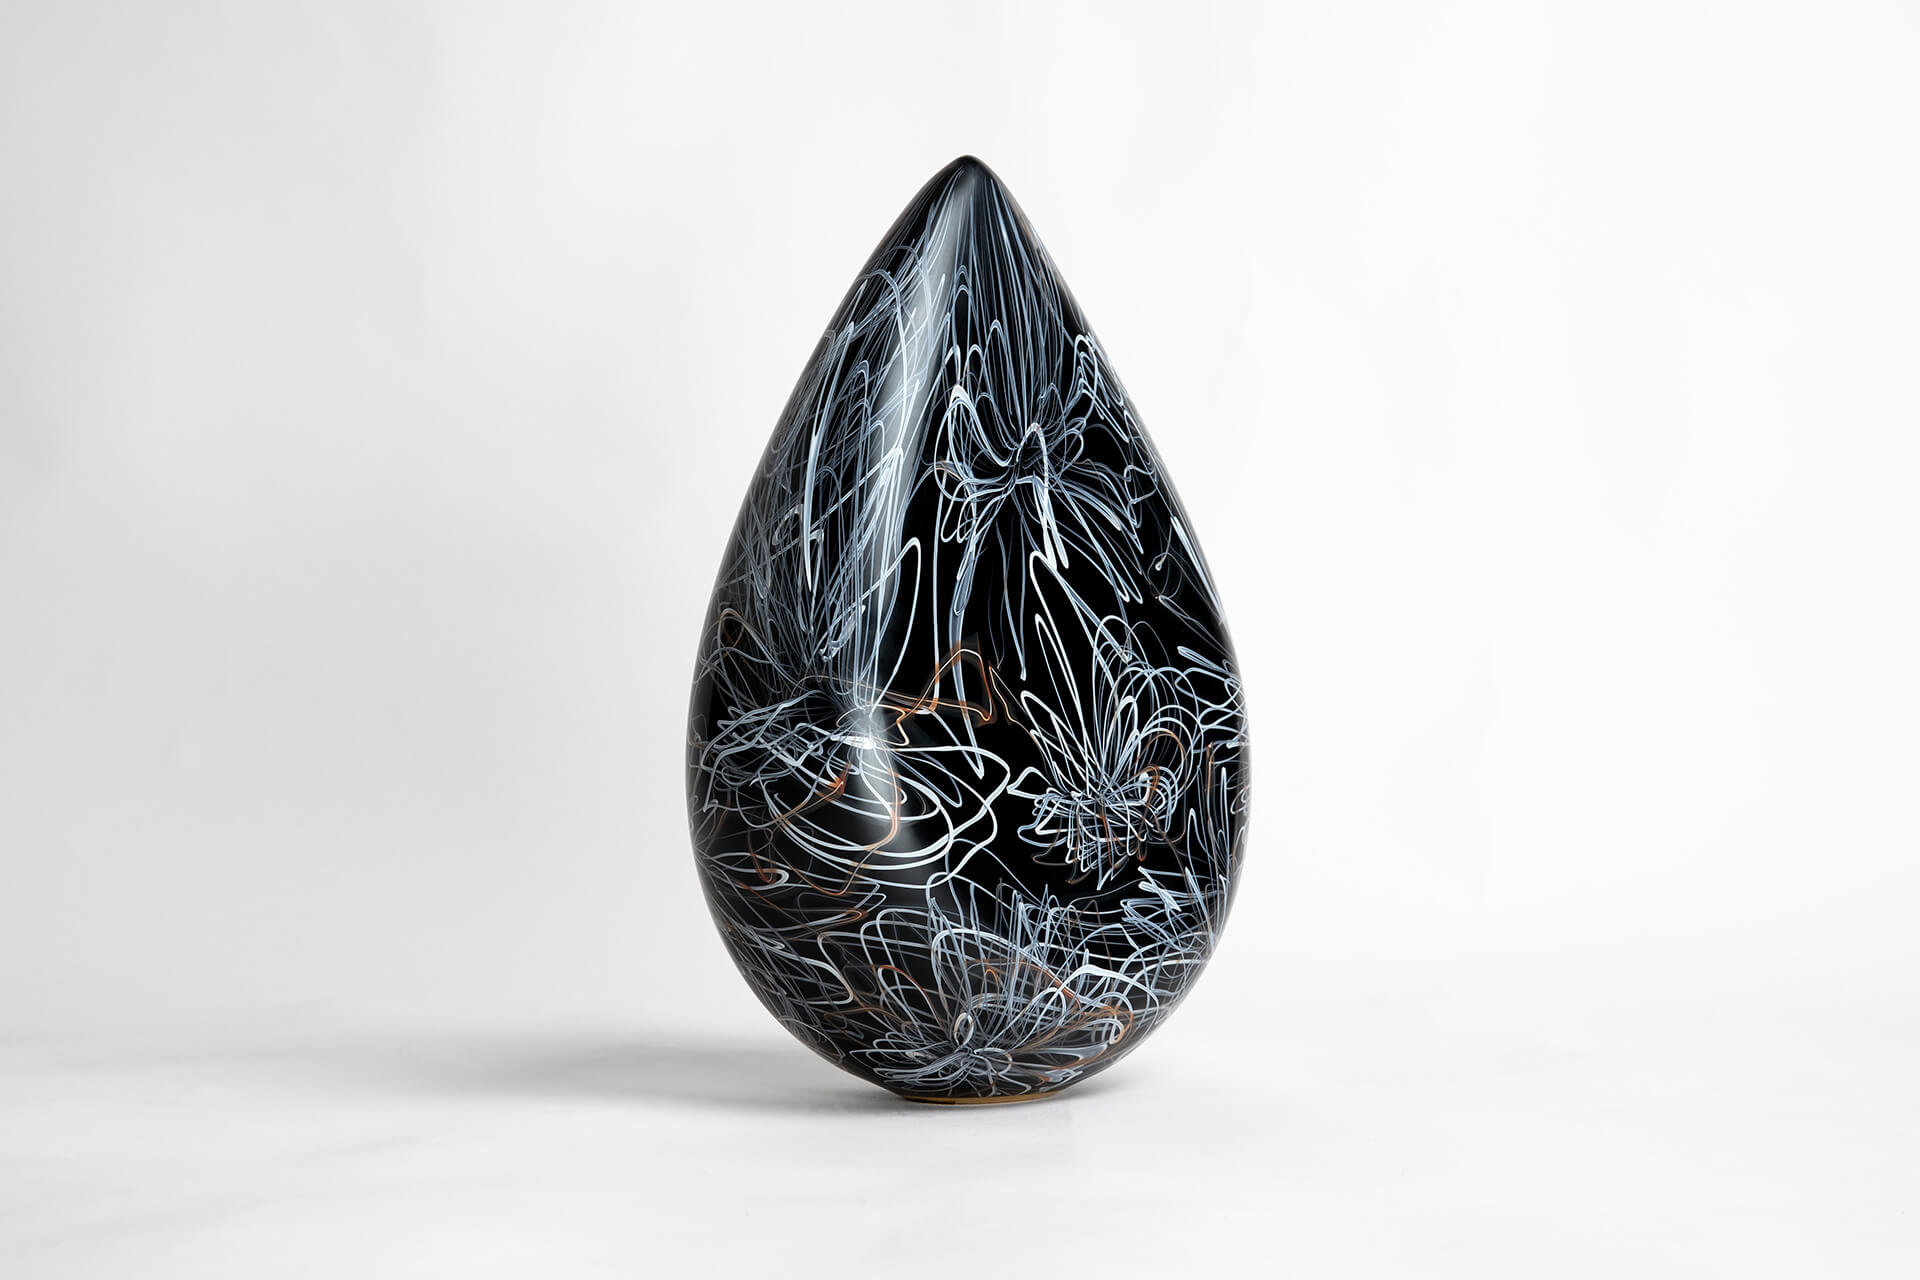 Glass Artist, Glass Art, Glass Design, Glass Craft, Jonas Noël Niedermann,  Cæciliie Philipa Vibe Pedersen